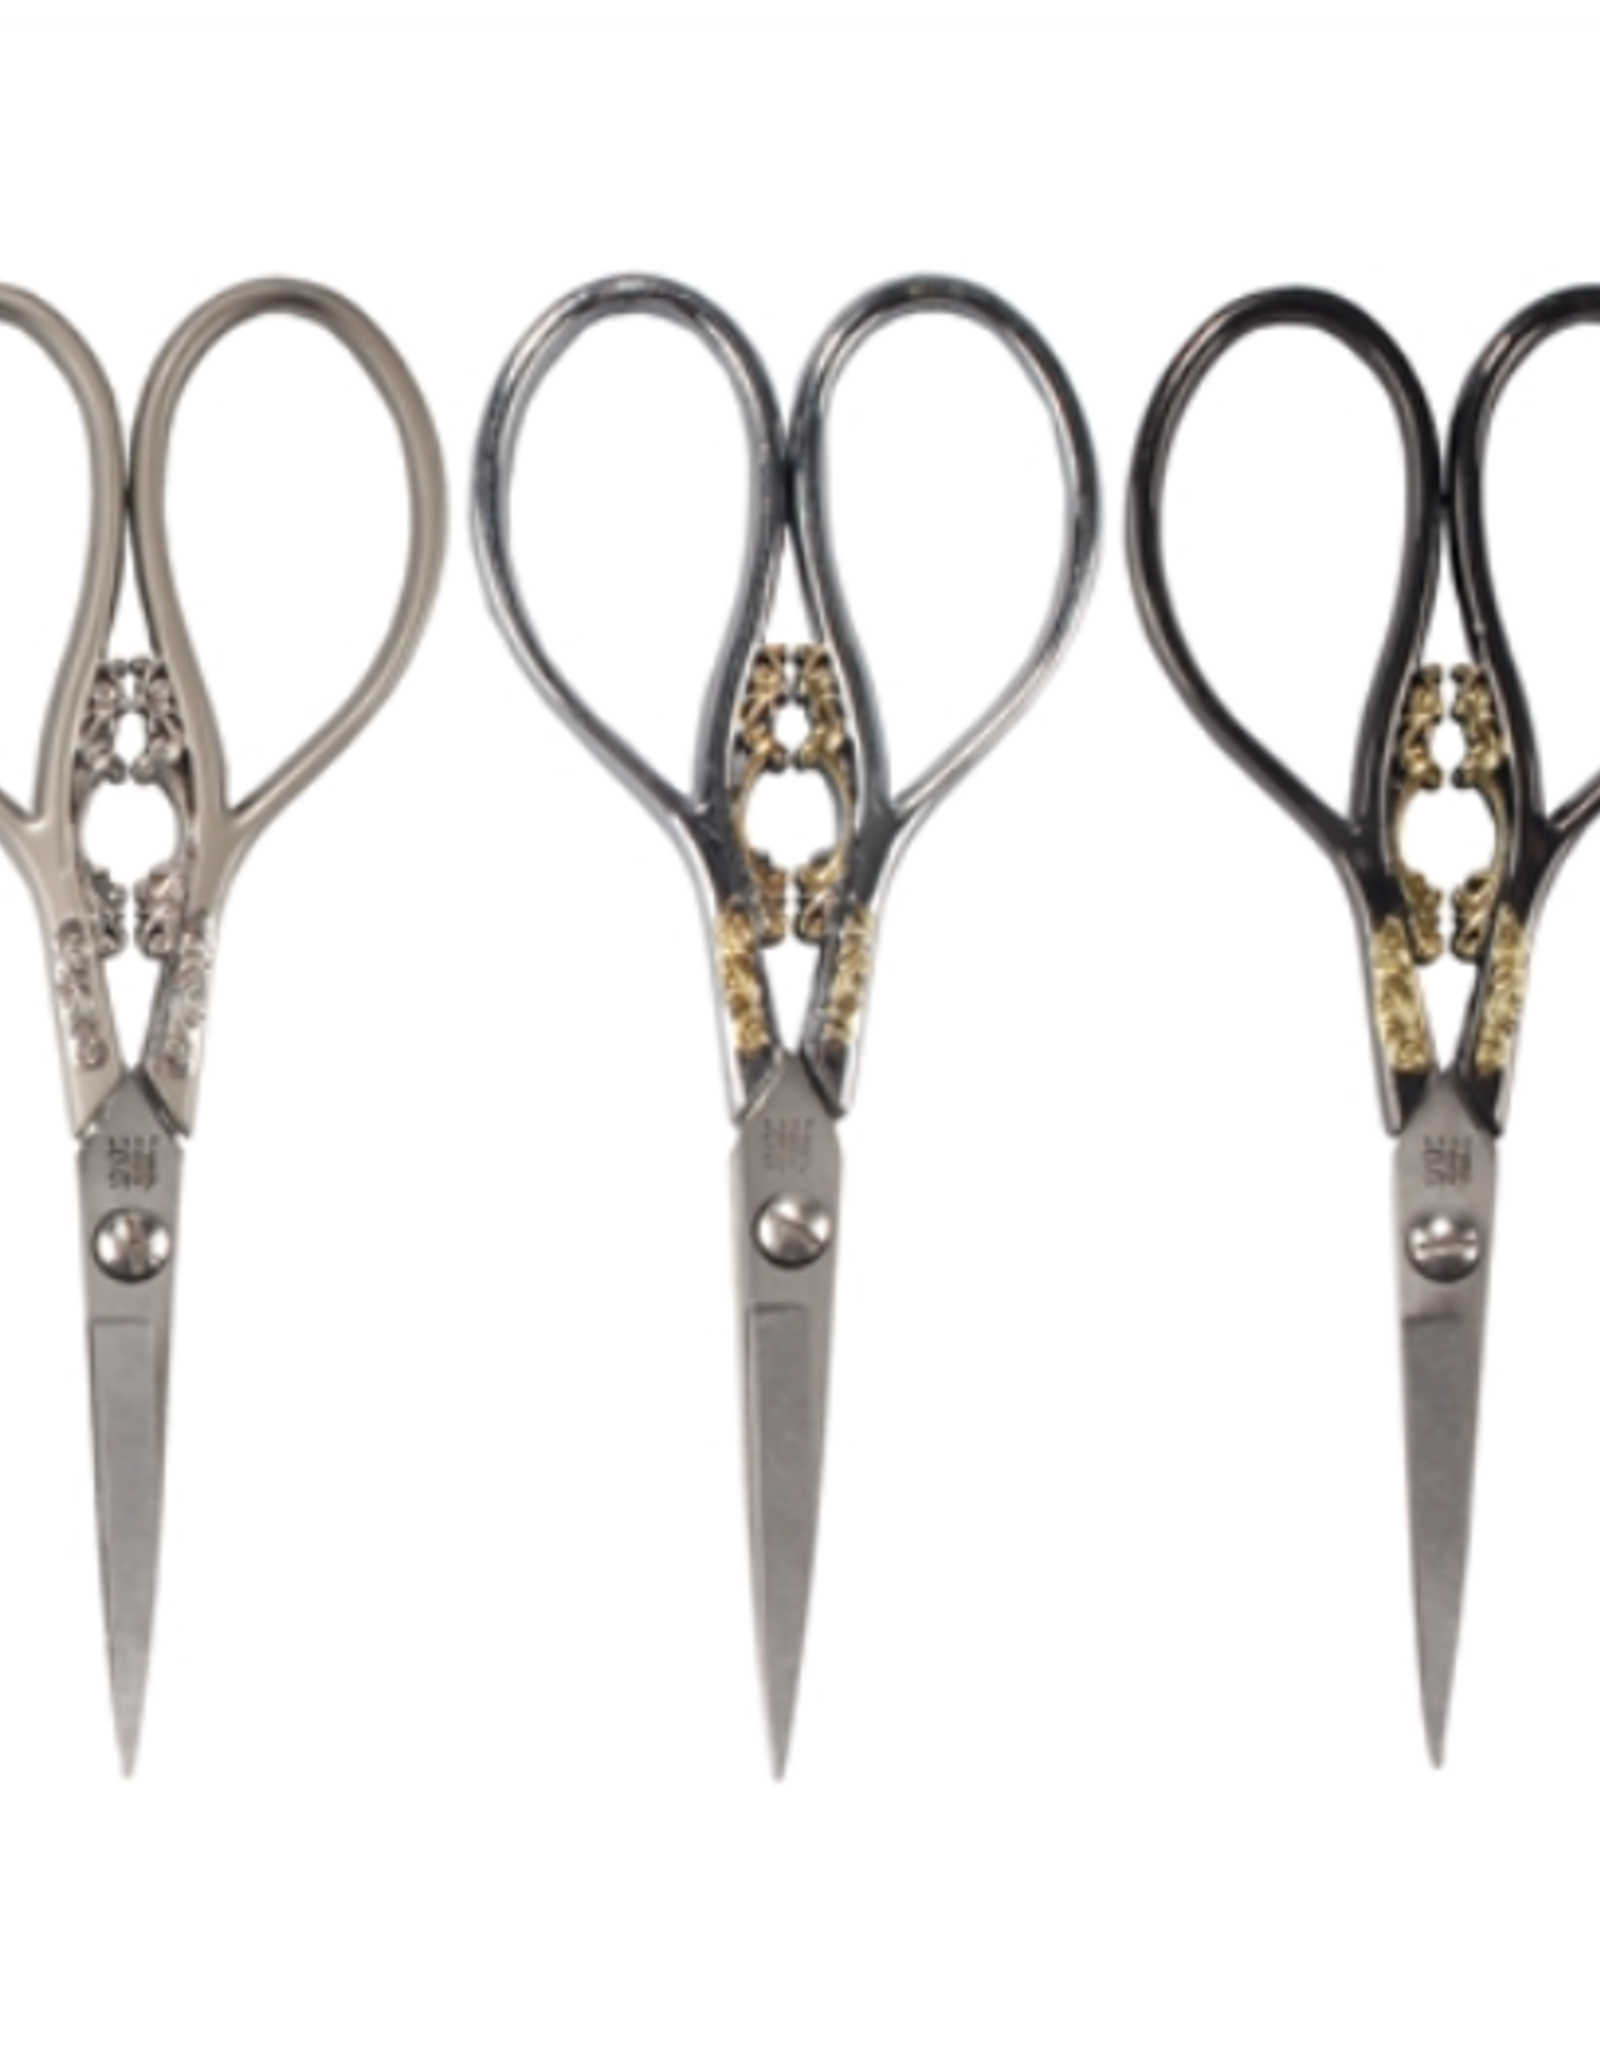 BambooMN Embroidery Scissors